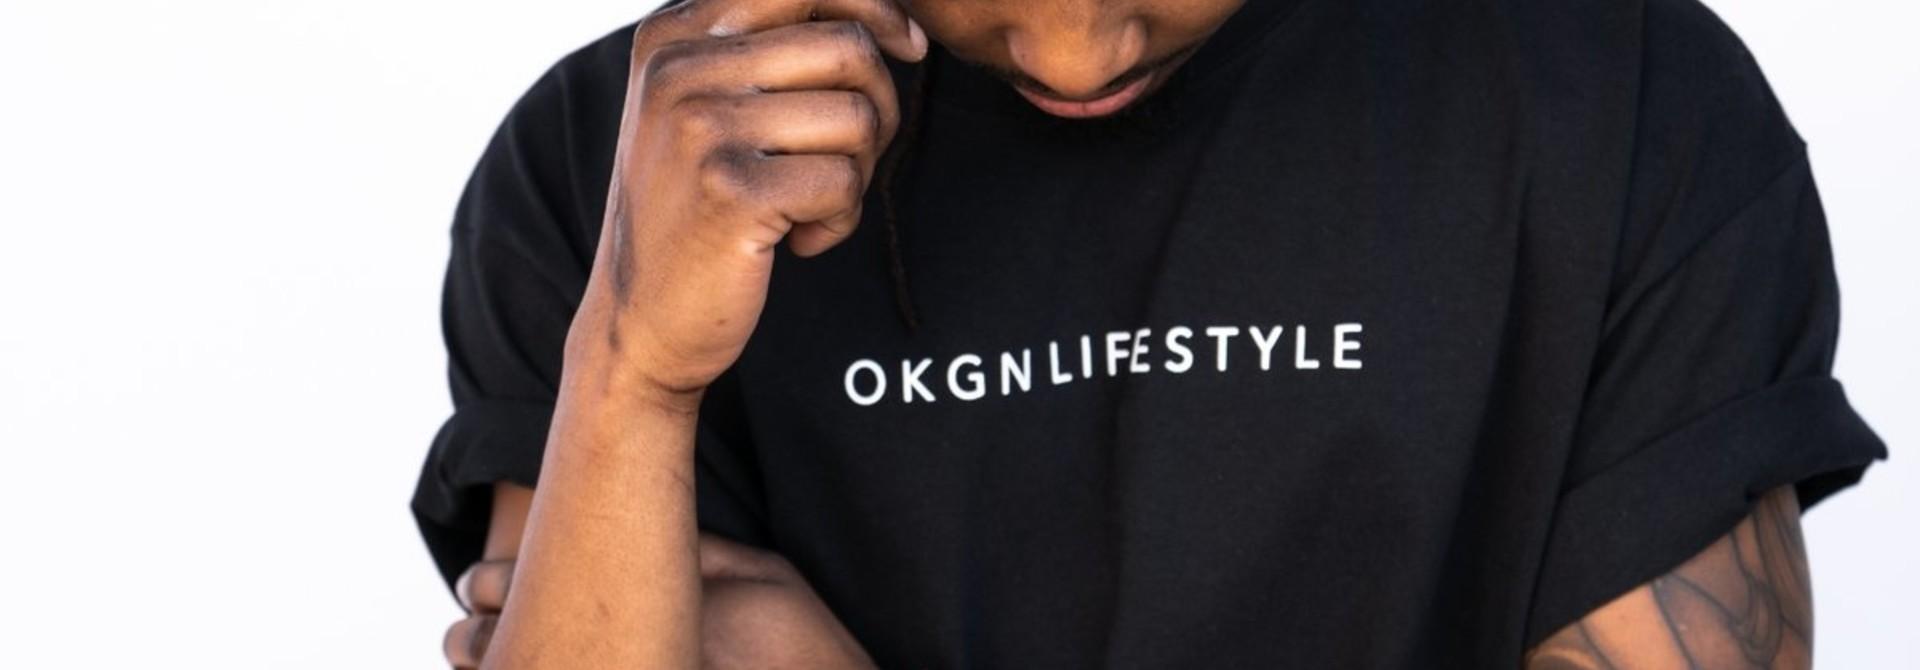 OKGN Lifestyle Oversized Tee